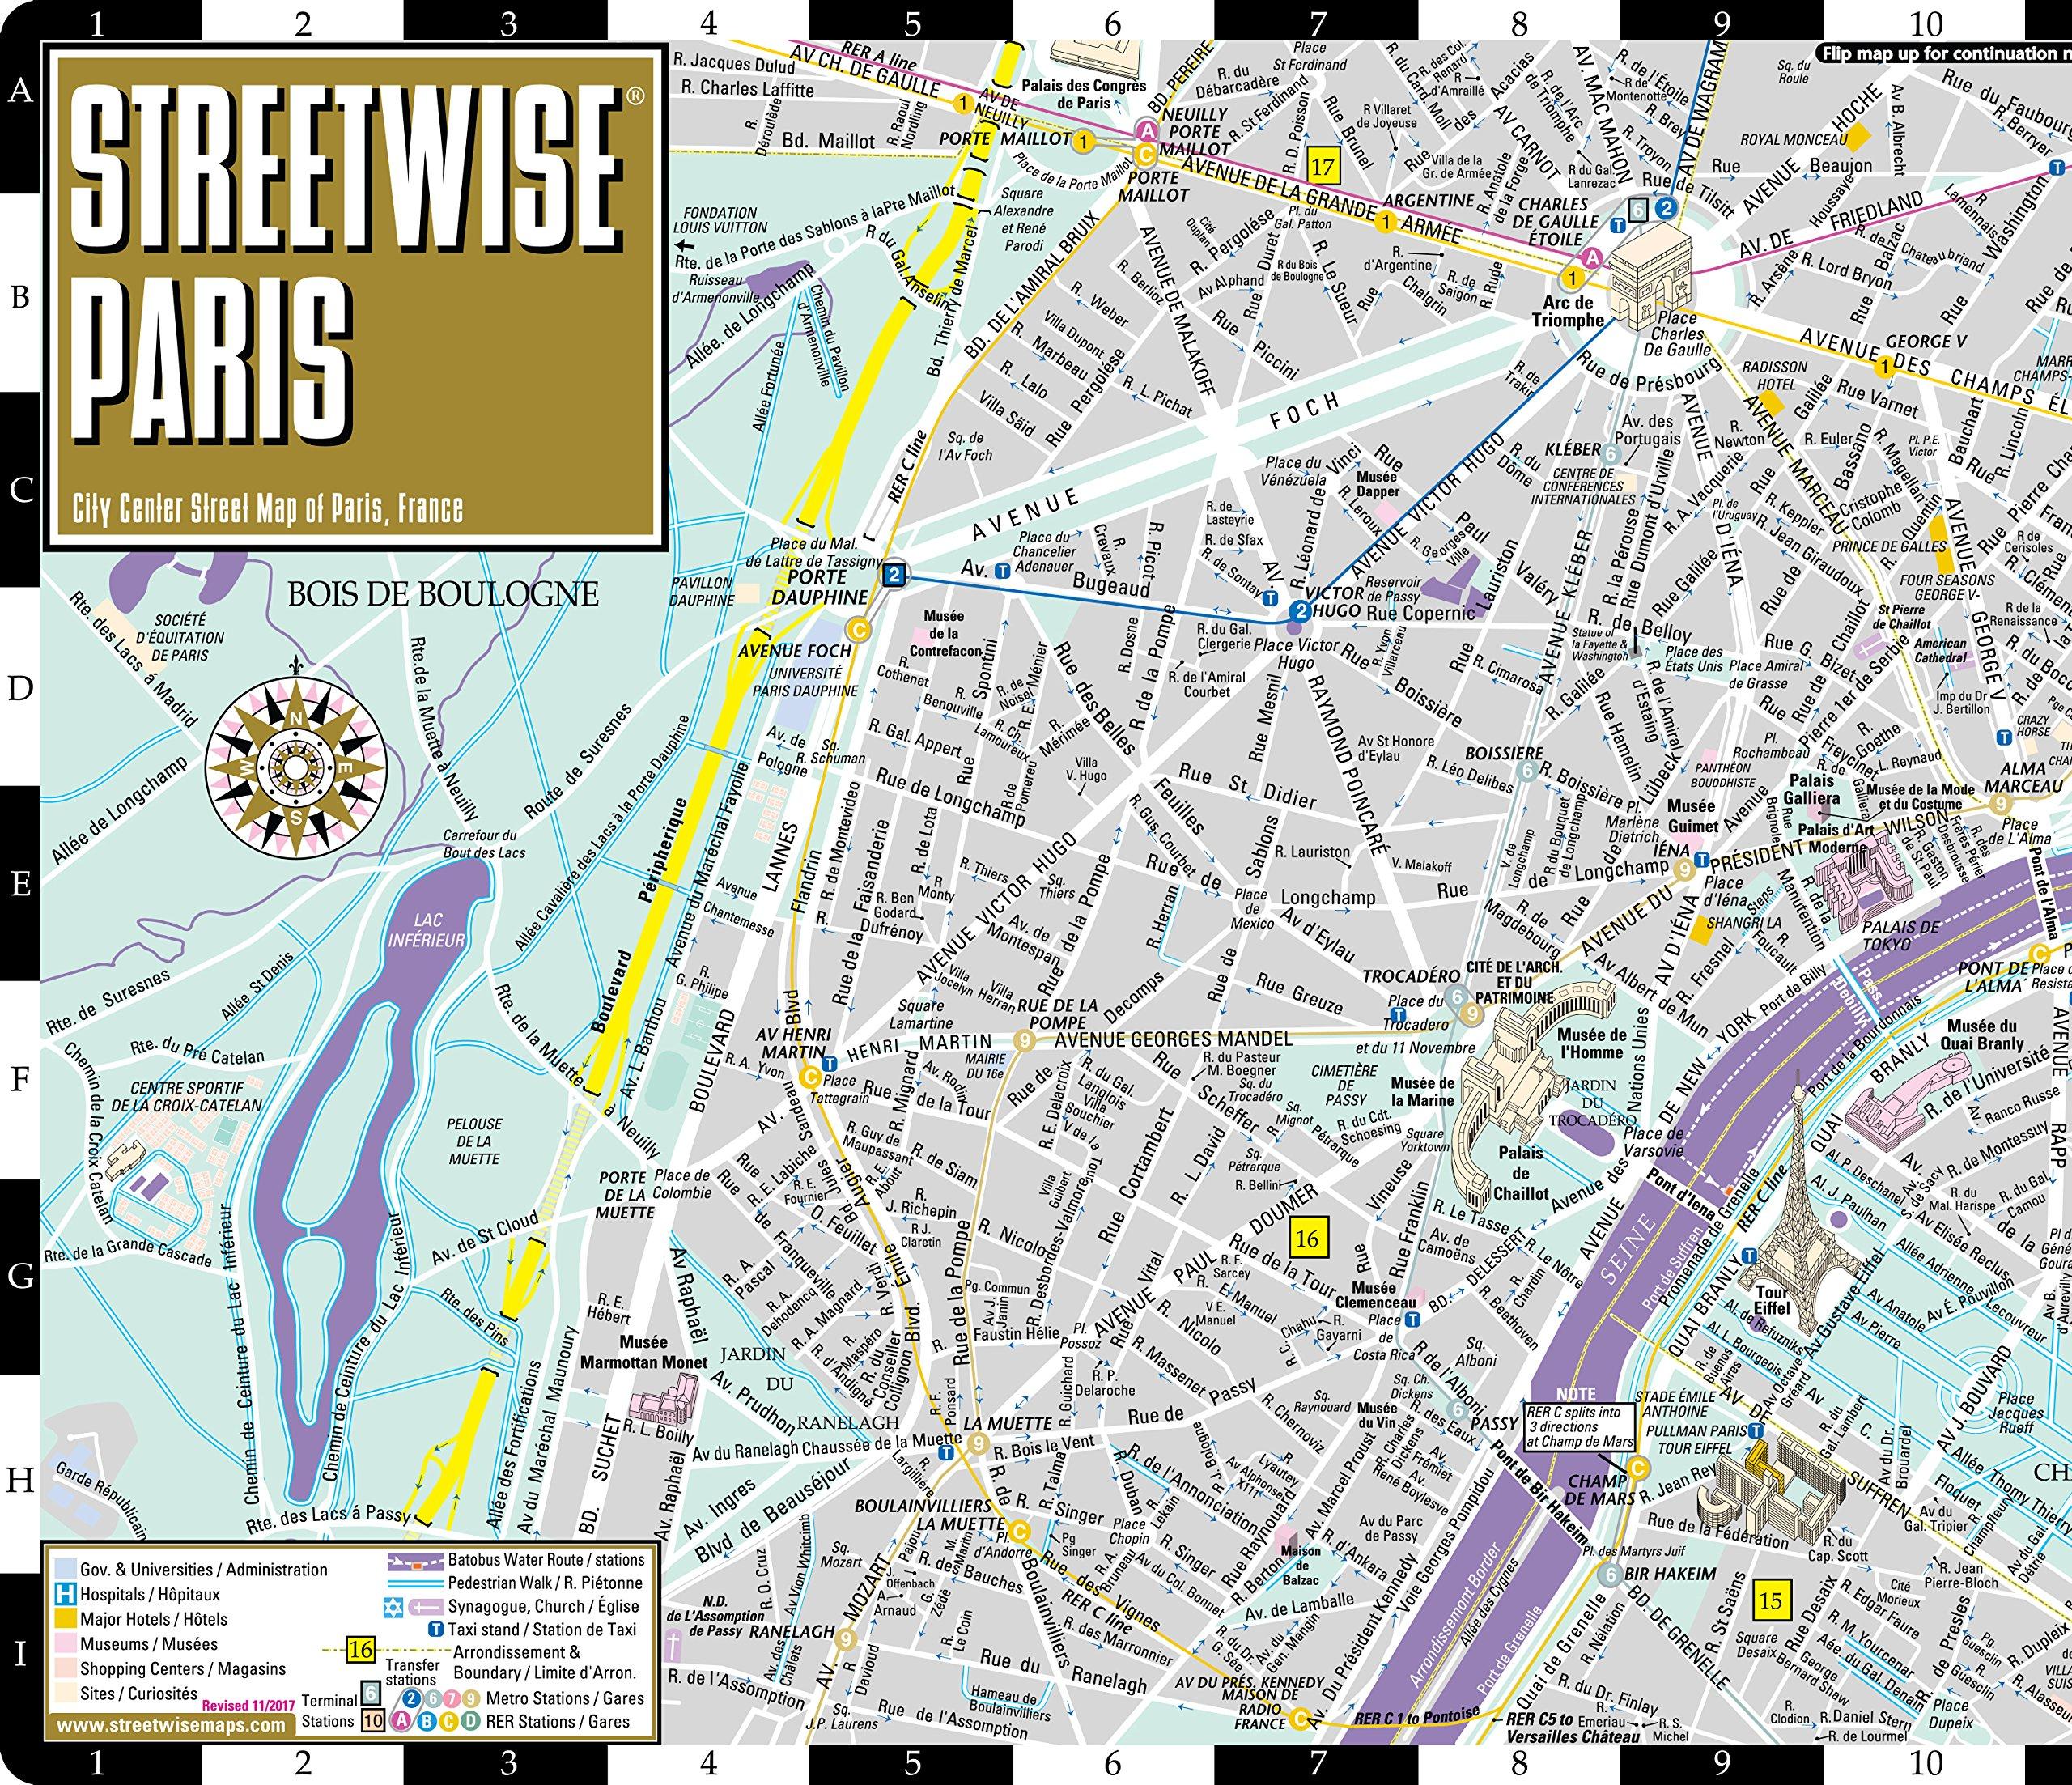 streetwise paris map laminated city center street map of paris france michelin streetwise maps michelin 9782067229785 amazoncom books